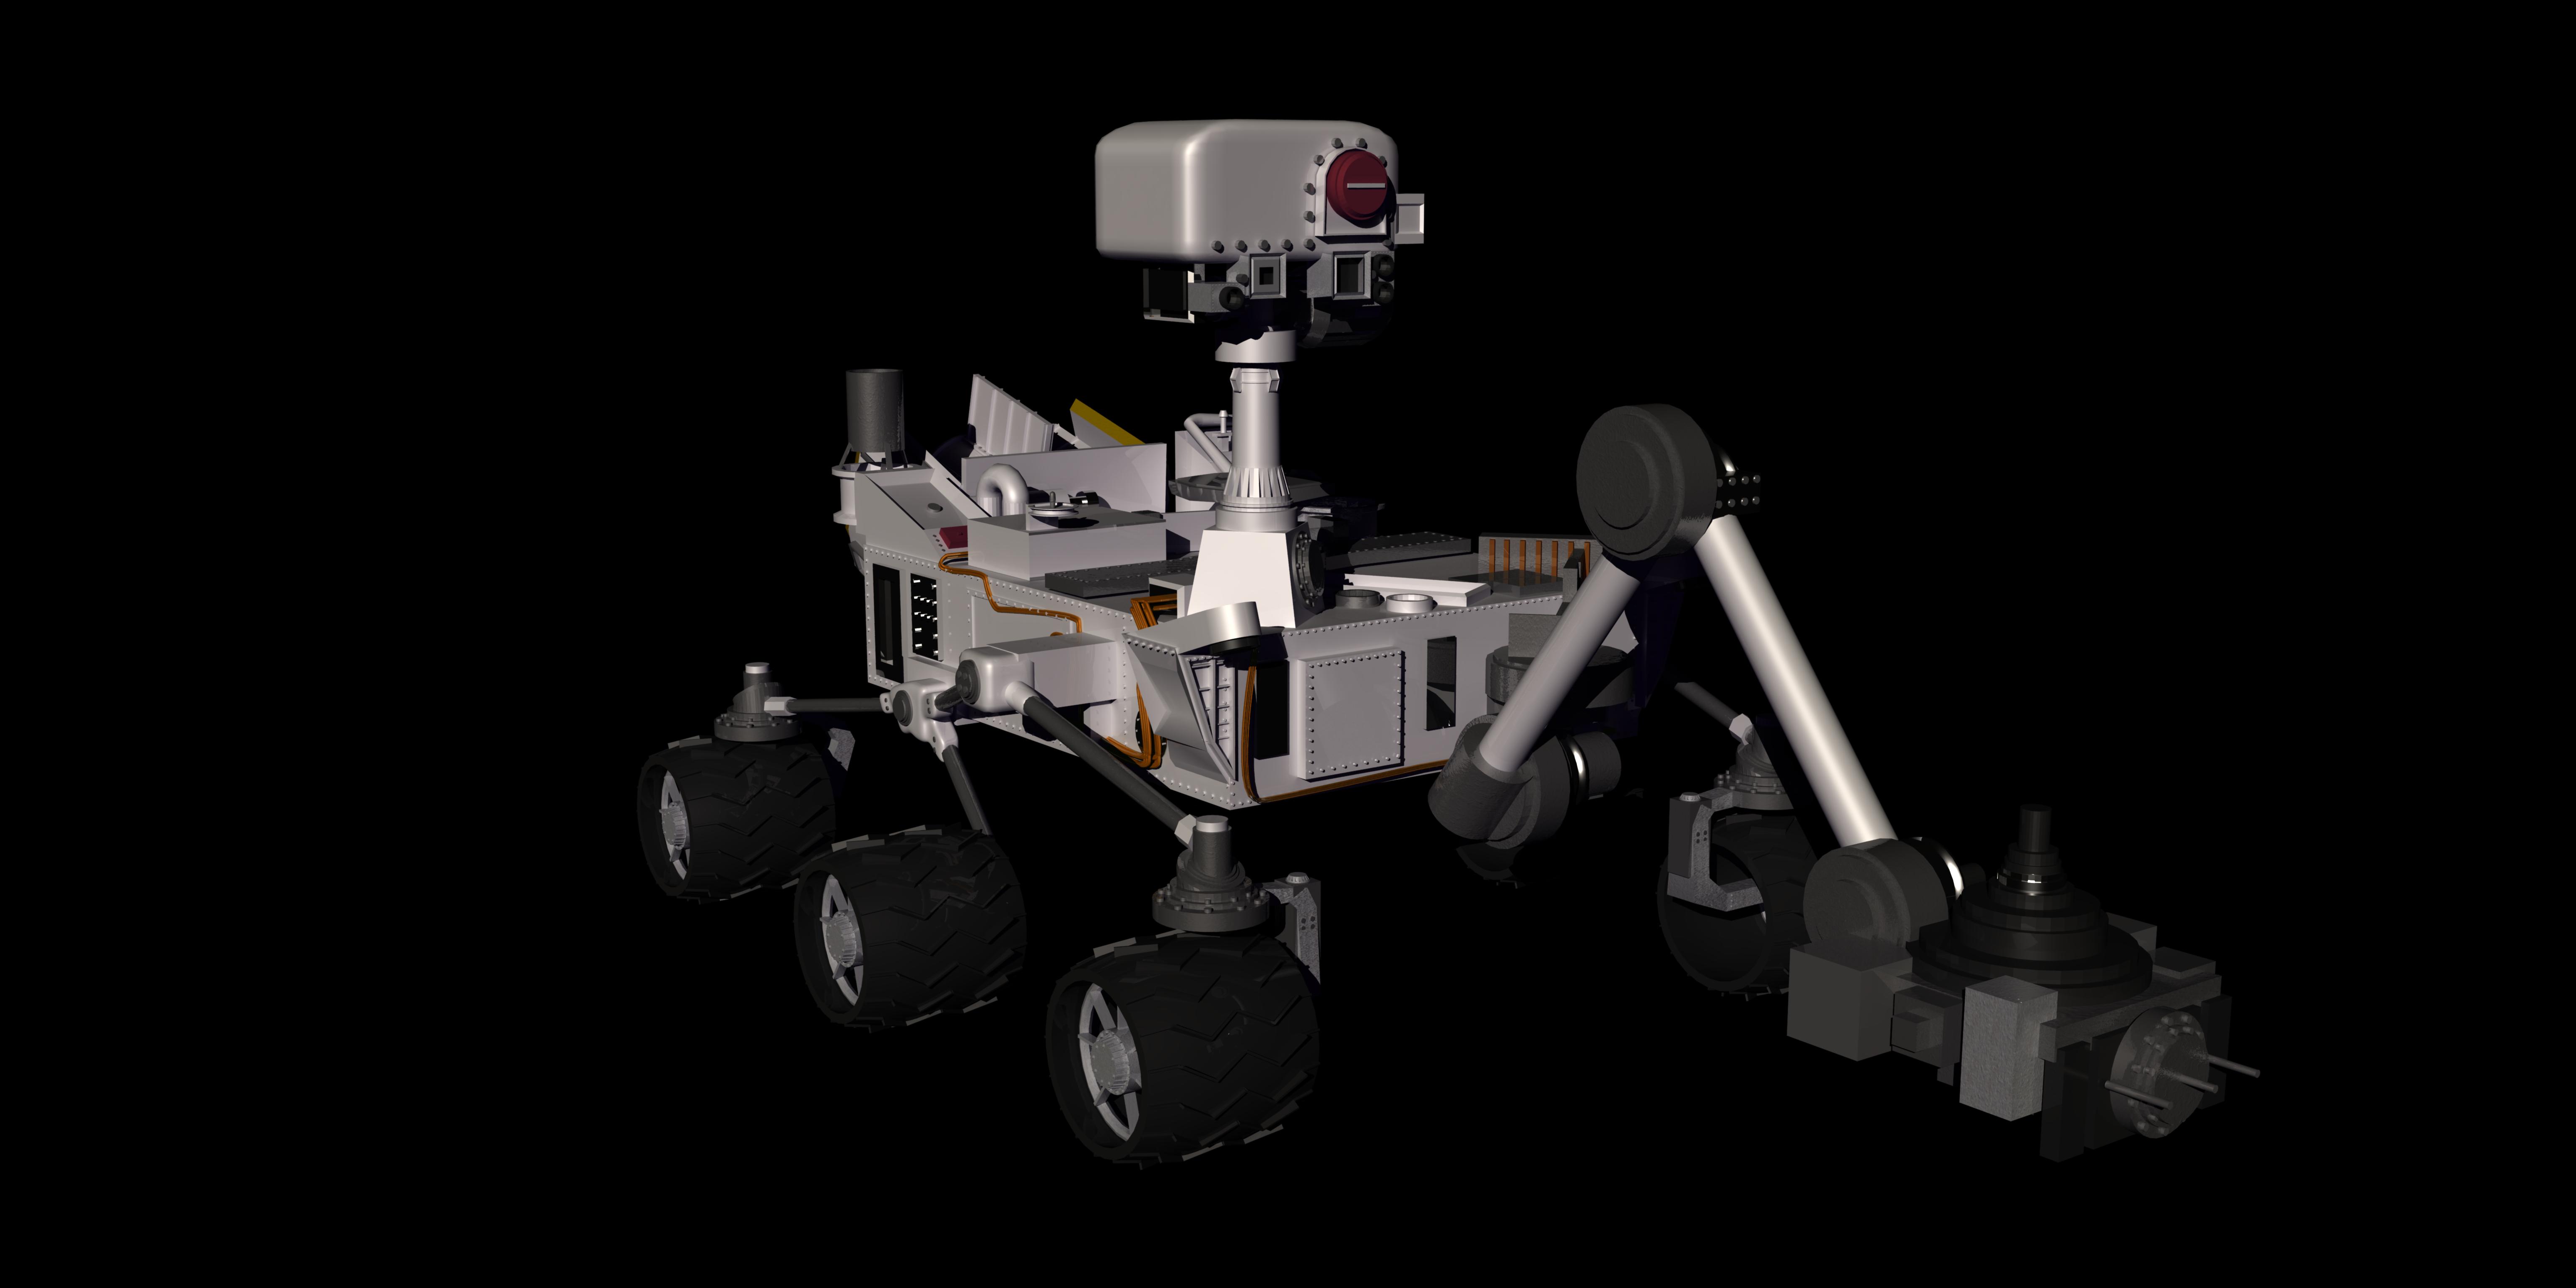 Curiosity 6k